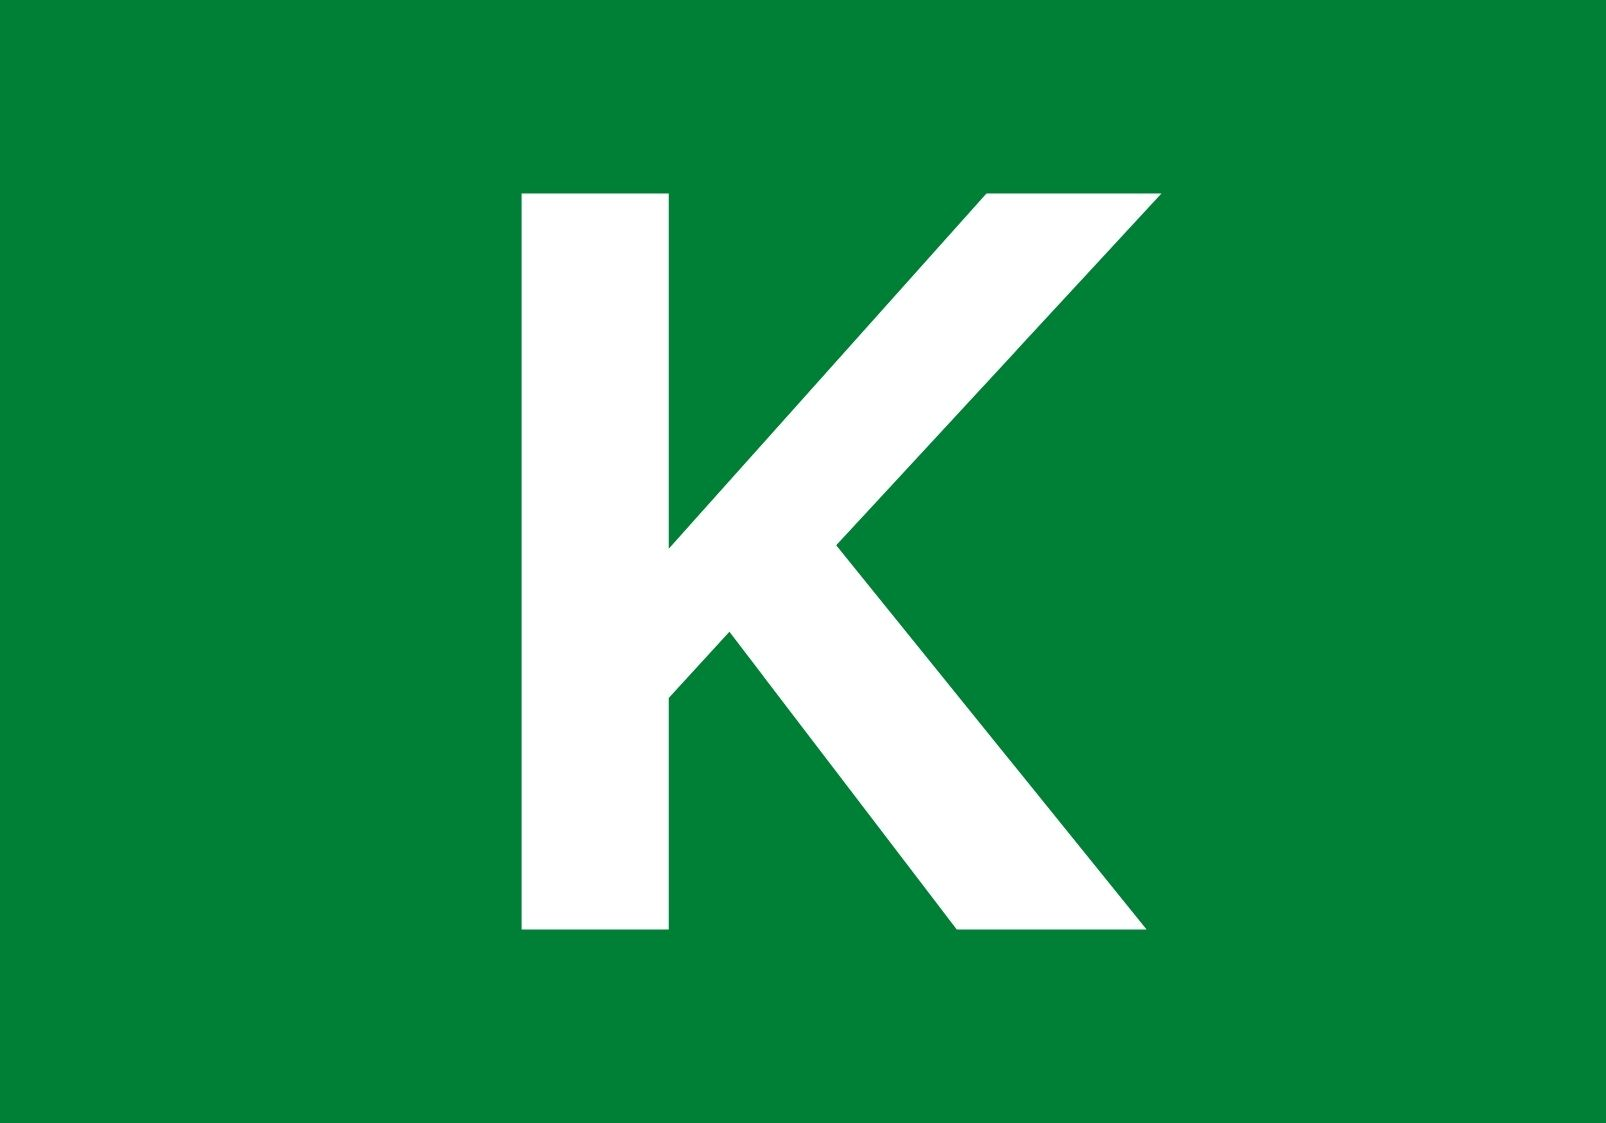 KLIMOTHECA